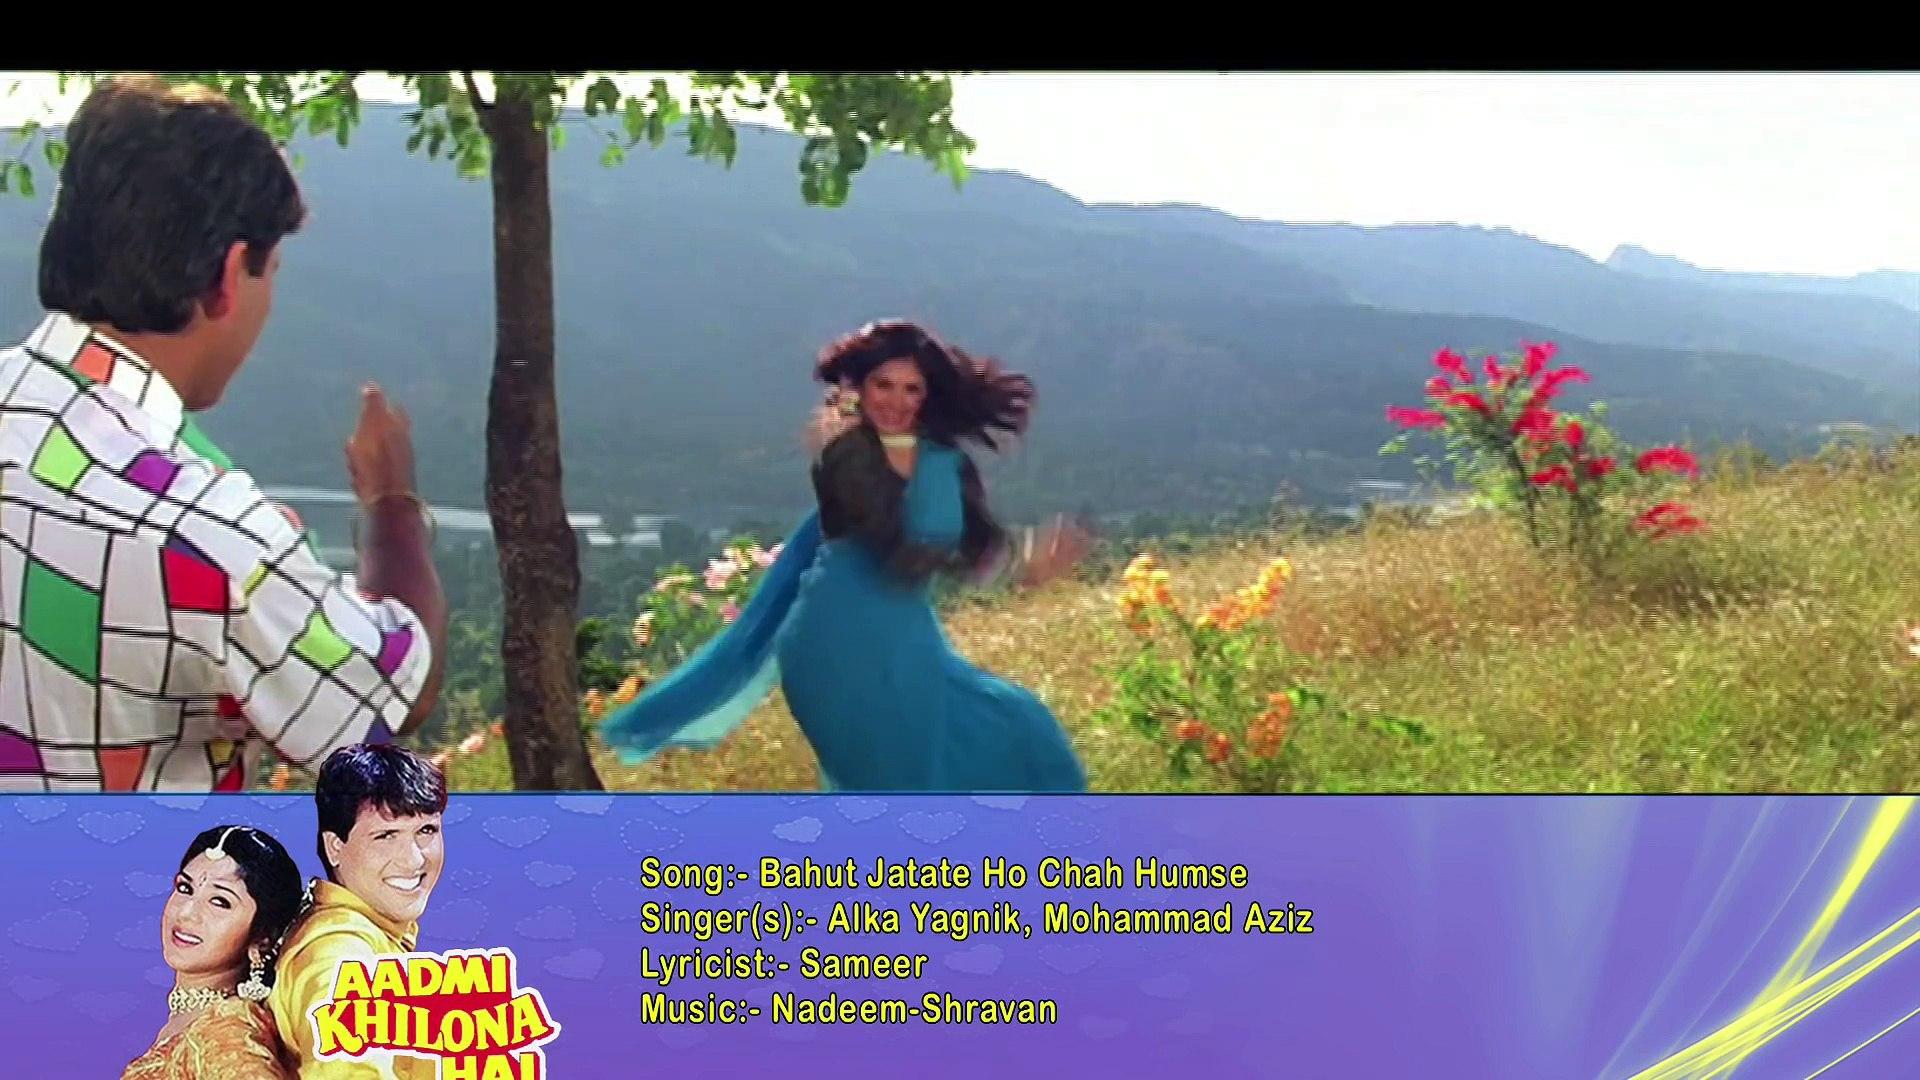 Bahut Jatate Ho Chah Humse - Alka Yagnik, Mohammad Aziz - Aadmi Khilona Hai 1993 Songs - Govinda